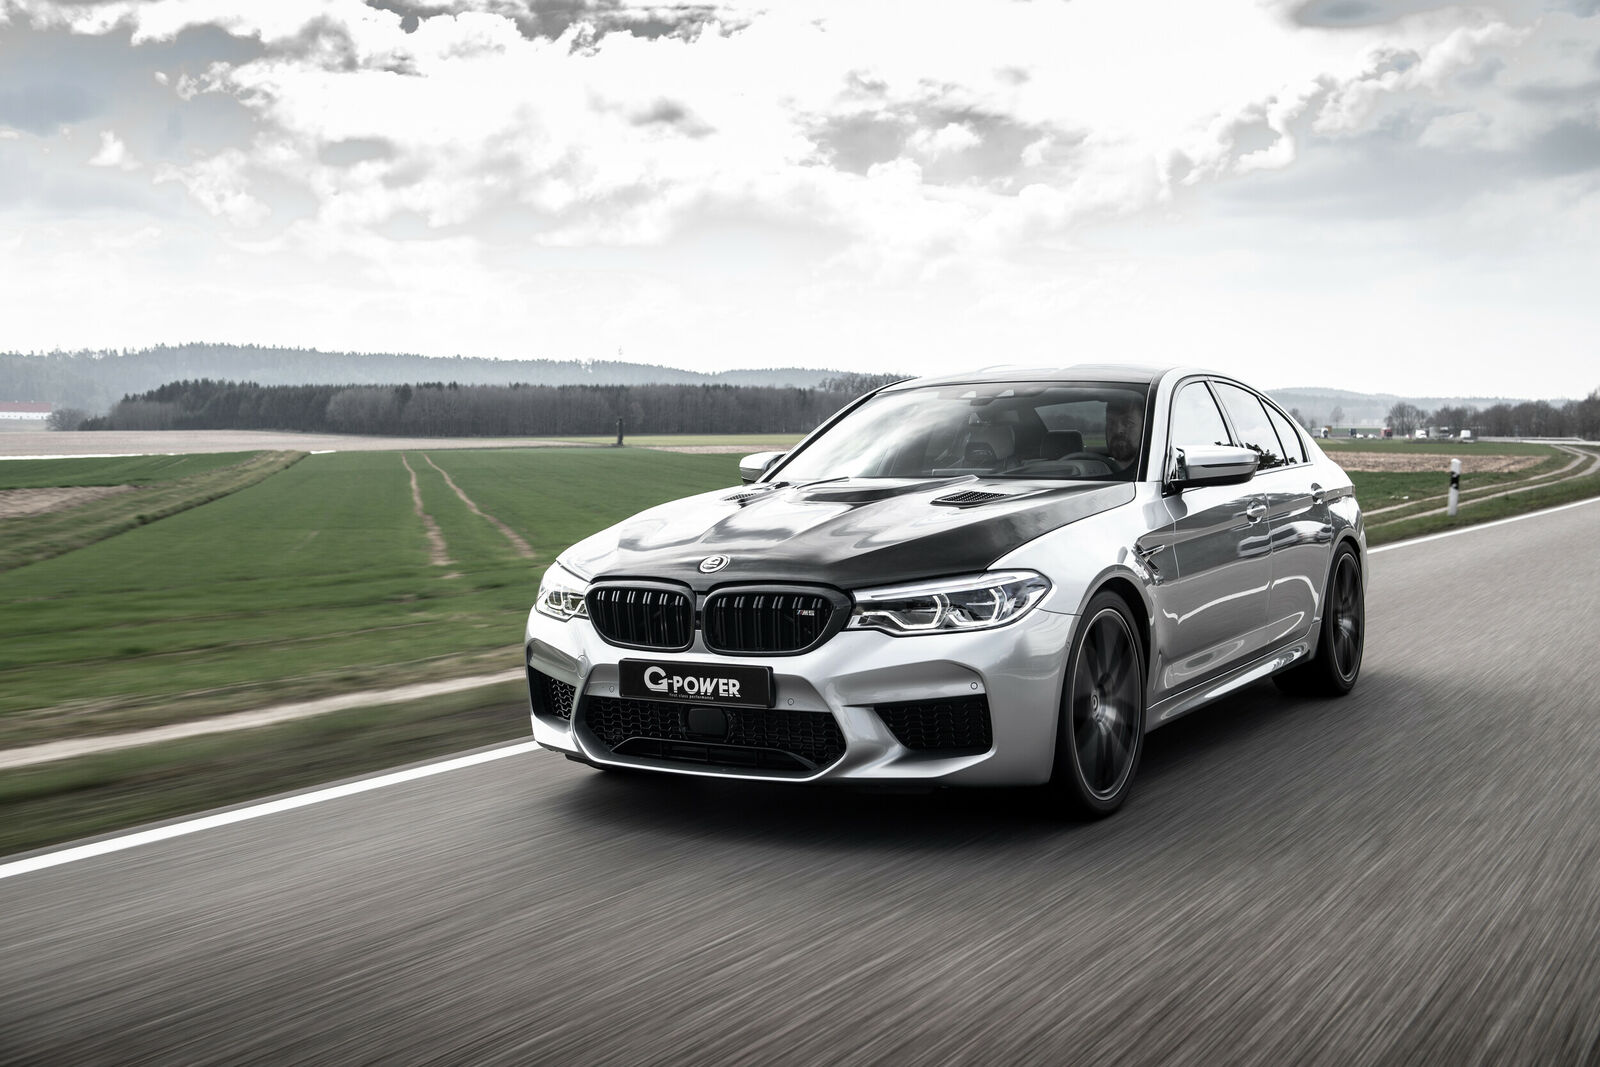 BMW_M5_G-Power_carbon_0002